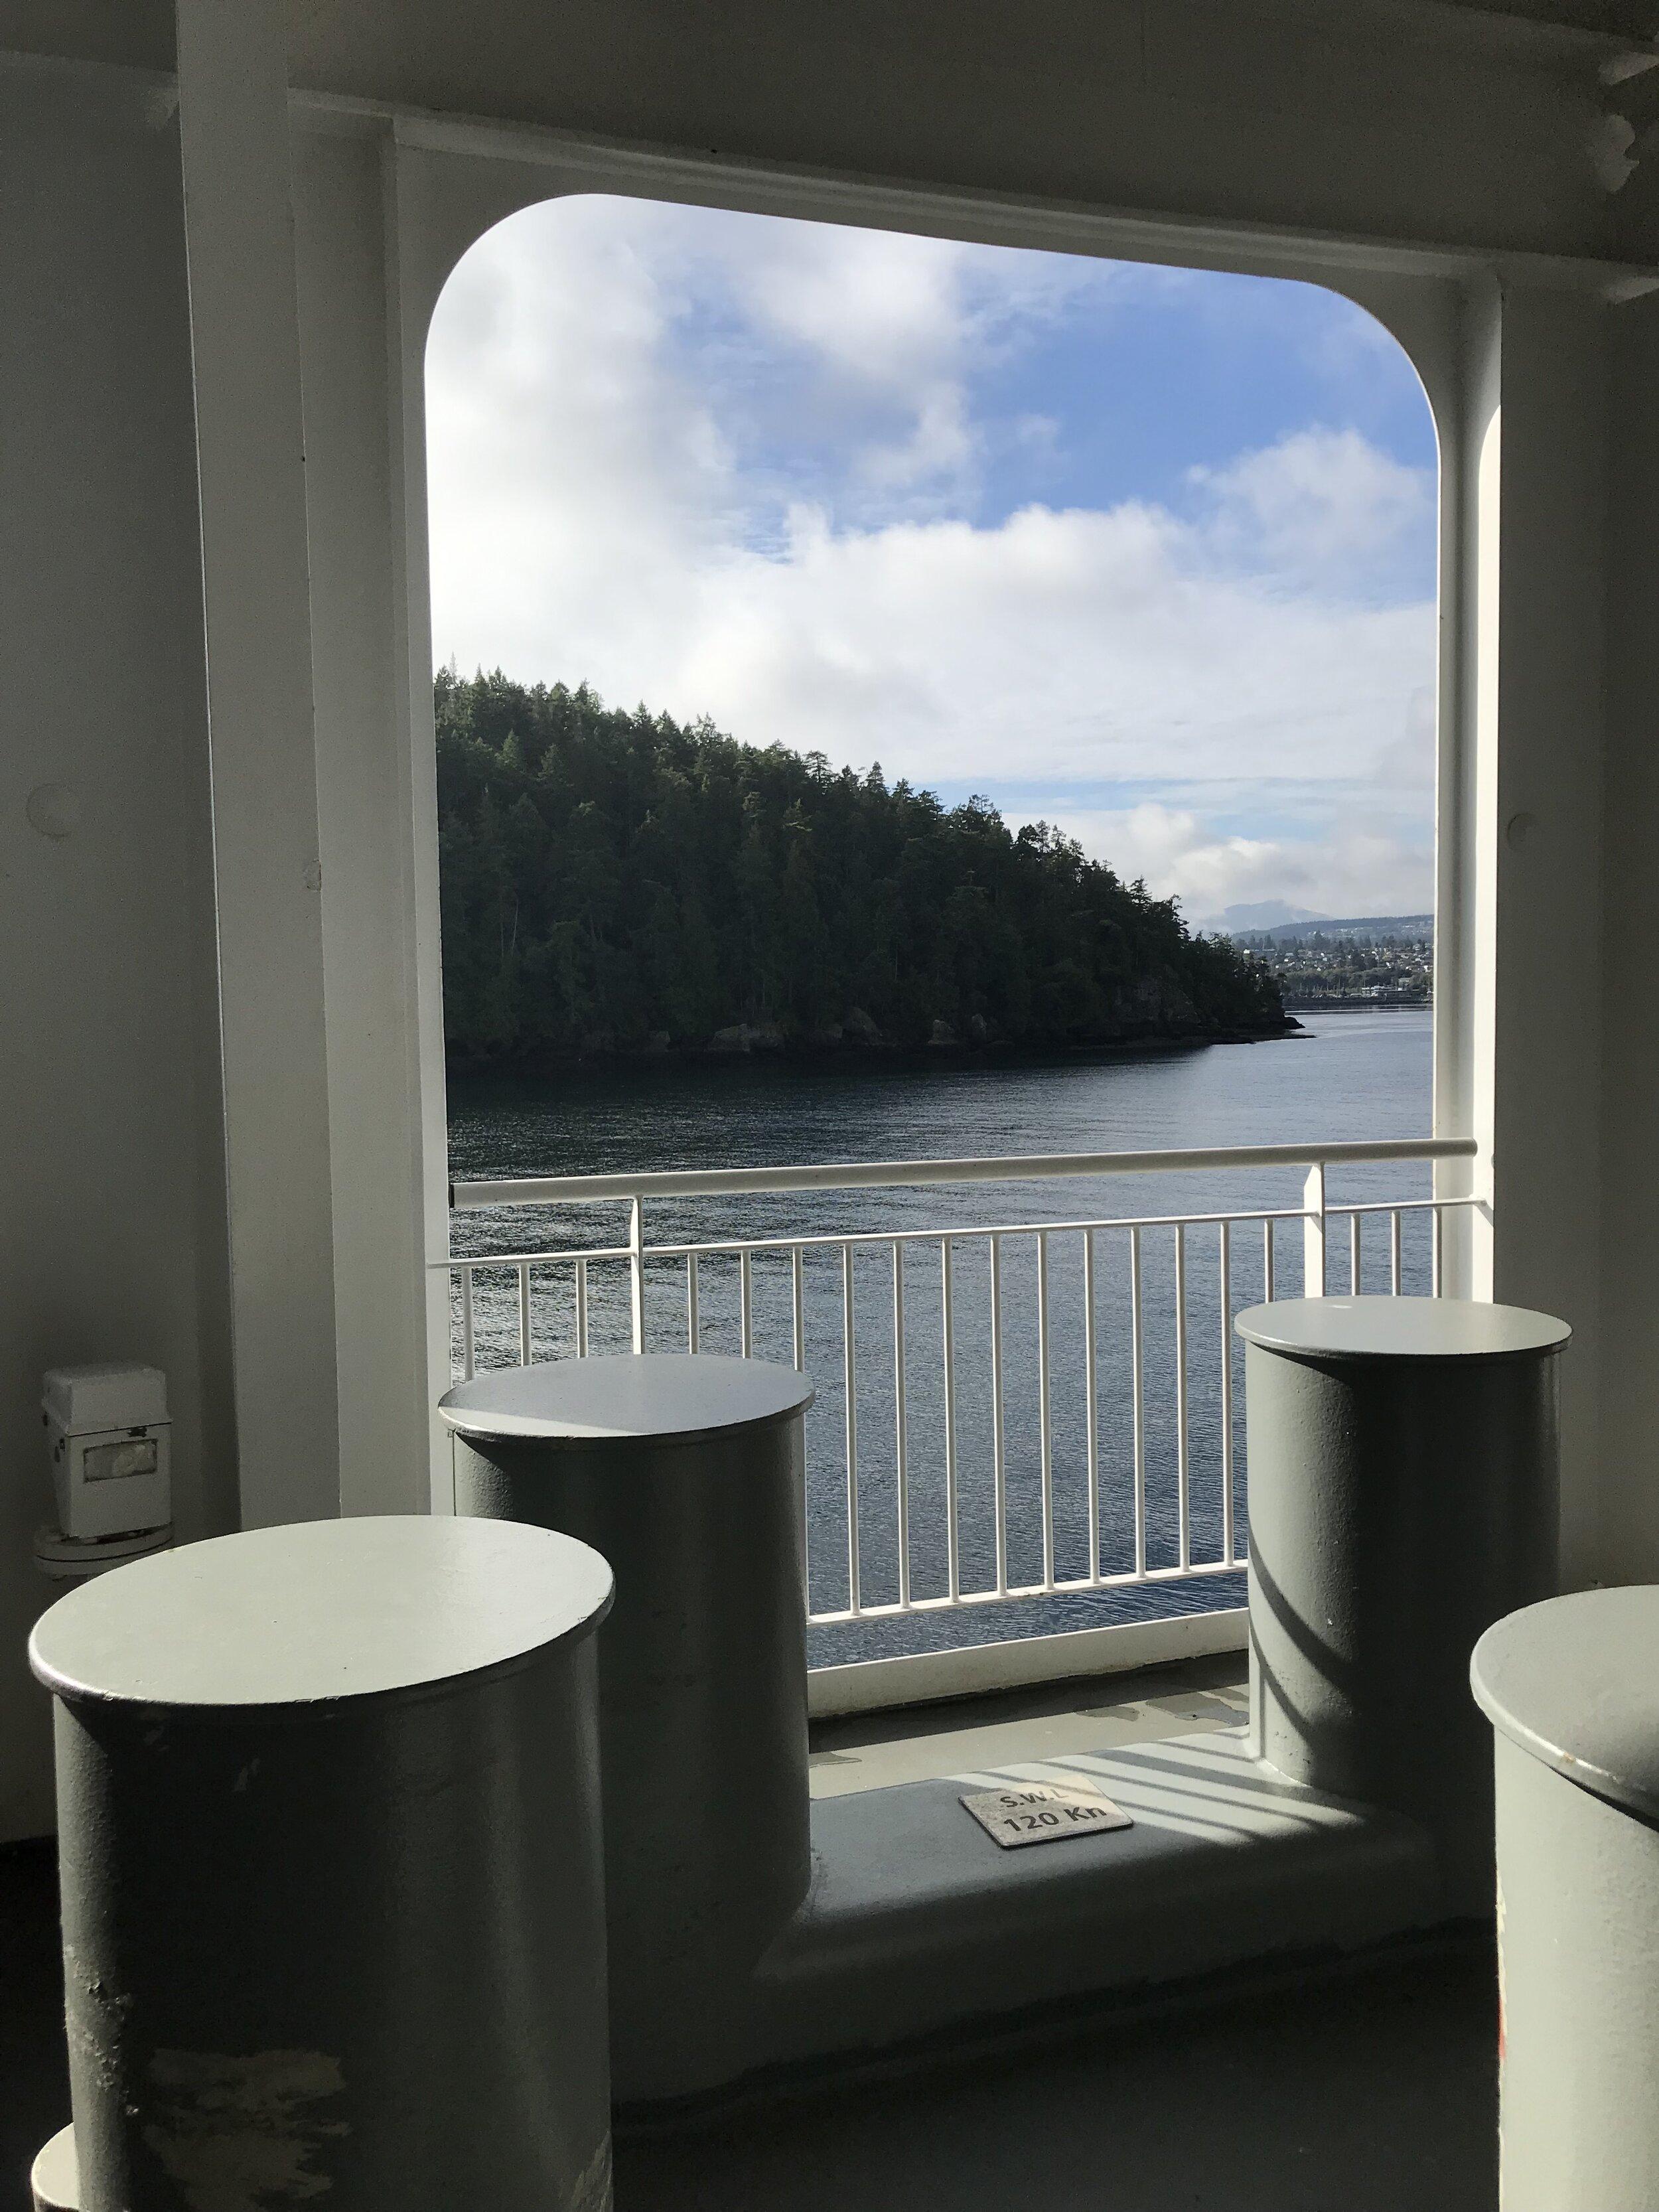 on the ferry, nanaimo peeks around the corner